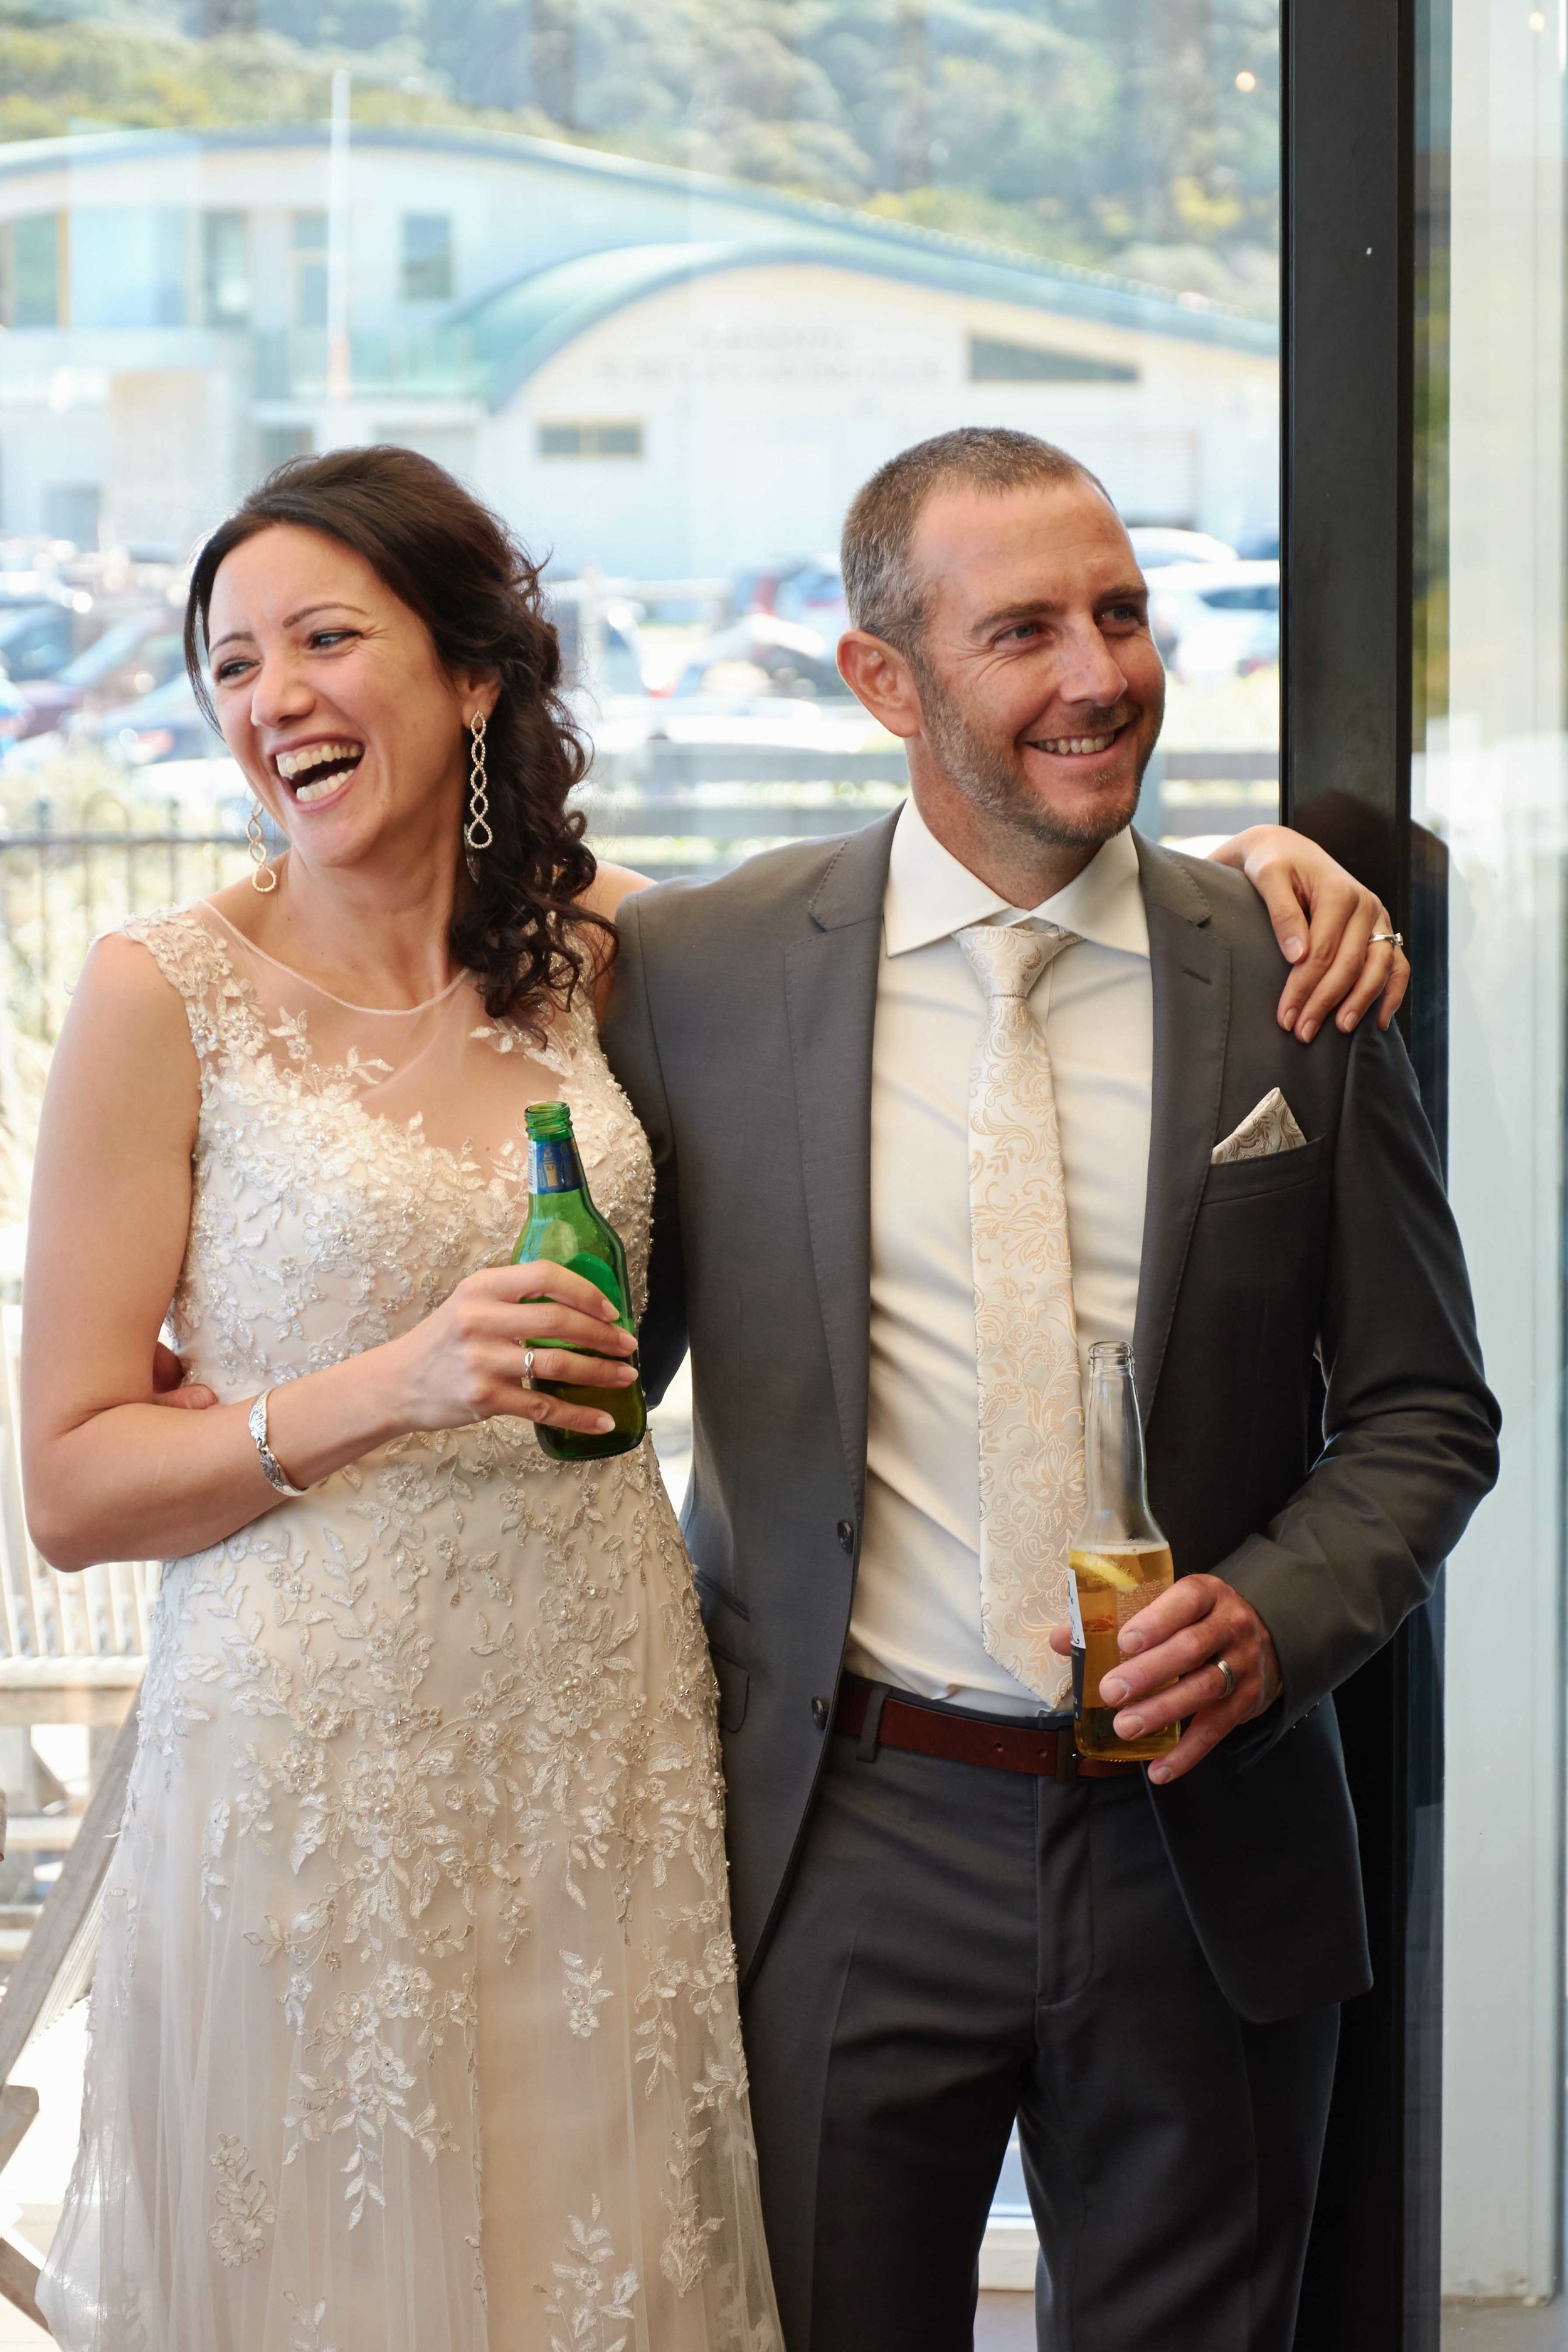 sorrento-wedding-photography-all-smiles-marissa-jade-photography-89.jpg